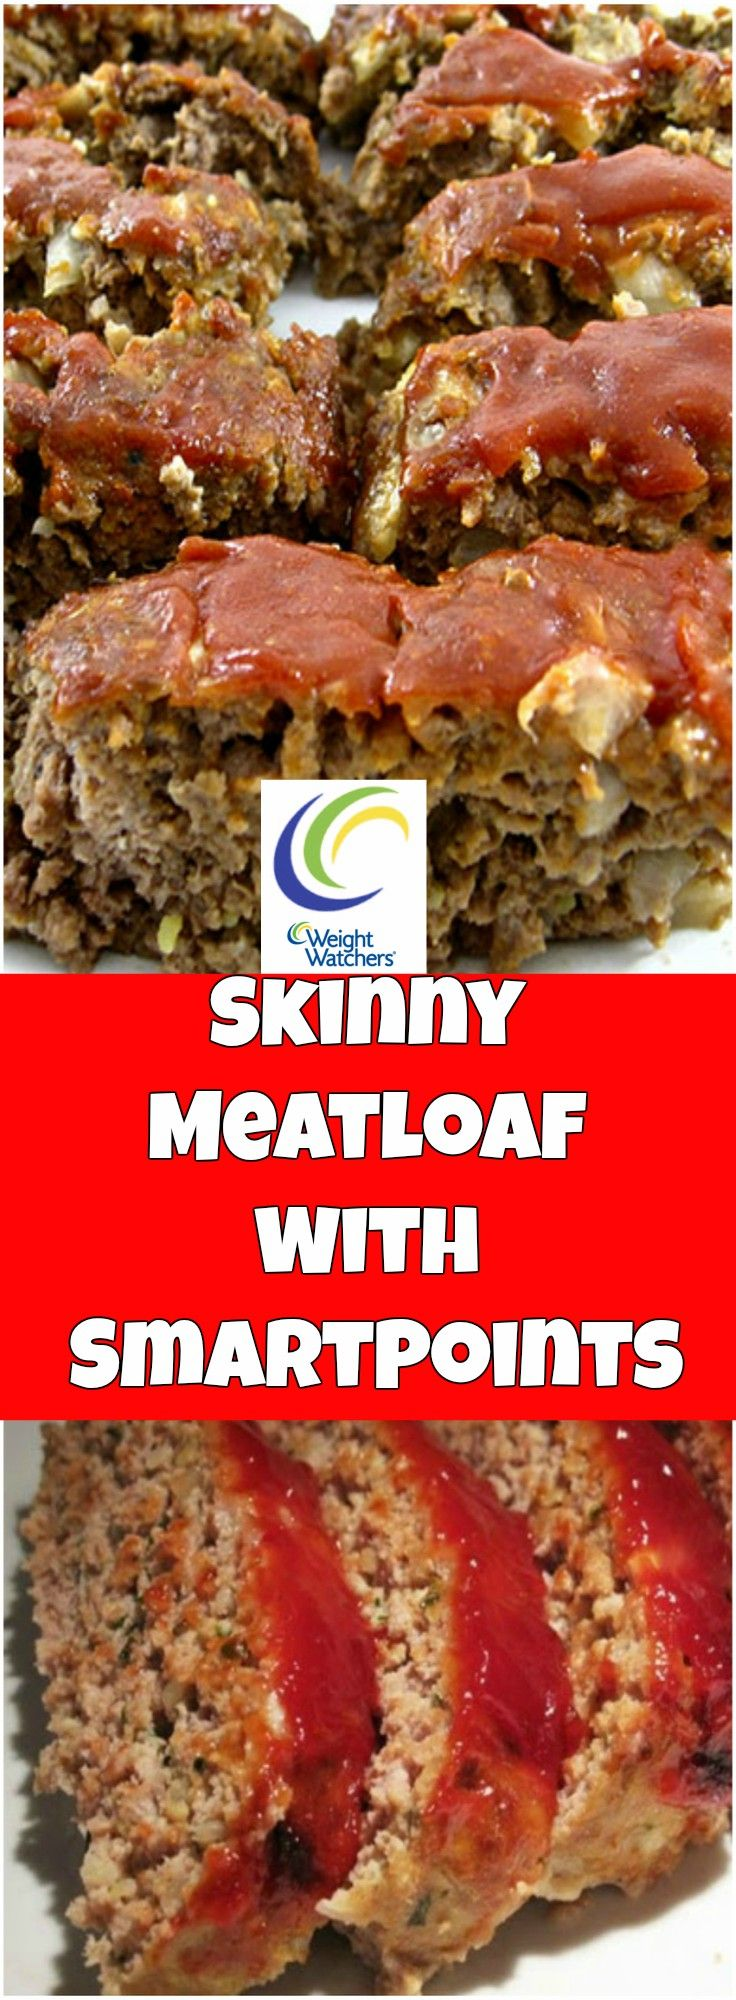 Skinny Meatloaf 6 Weight Watchers SmartPoints